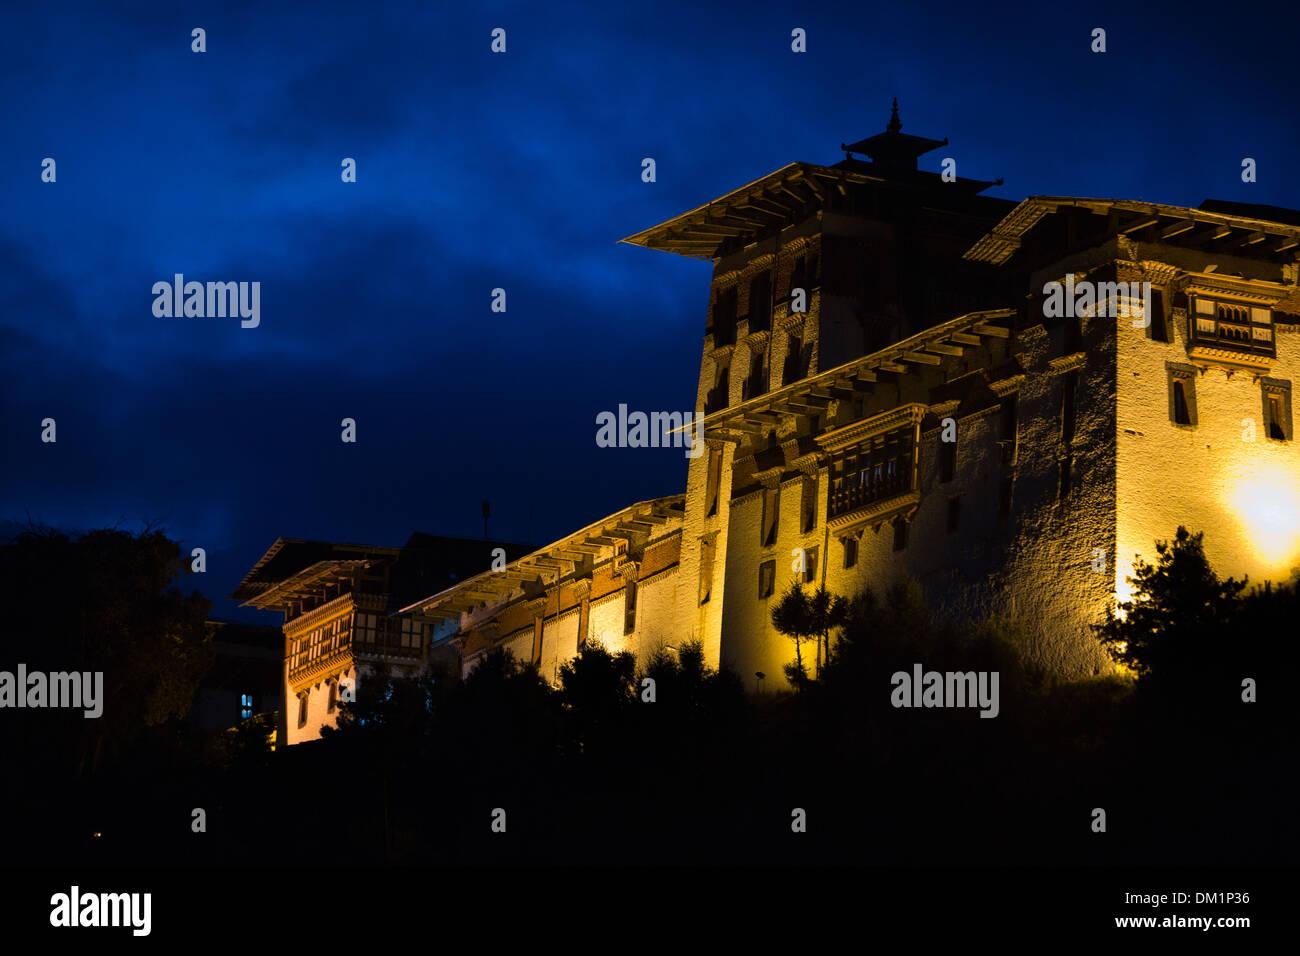 Bhutan, Bumthang Valley, Jakar Dzong, monastery illuminated at night - Stock Image